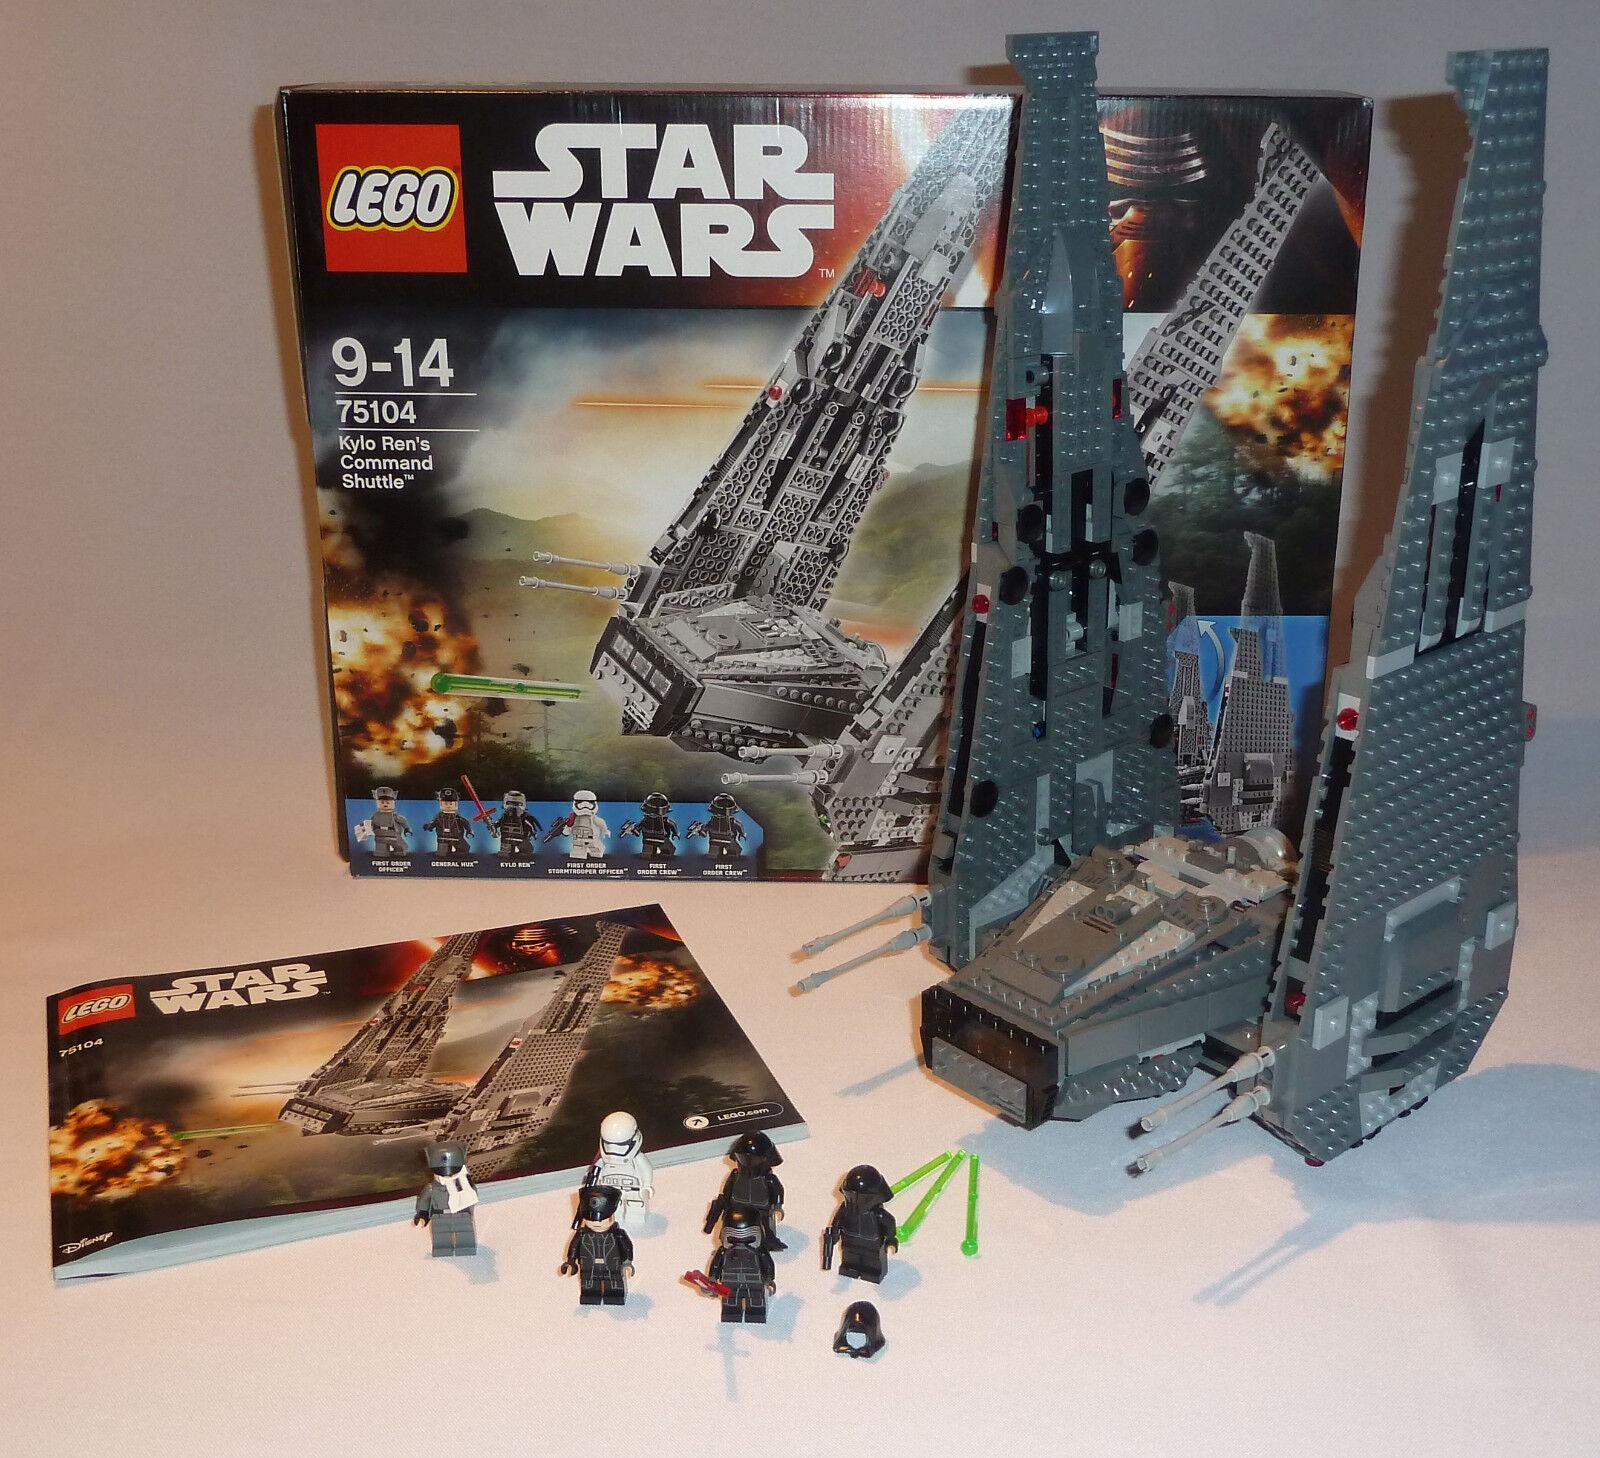 LEGO Star Wars 75104 Kylo Ren's Ren's Ren's Command Shuttle – TOP inkl. OVP und OBA 0689e2